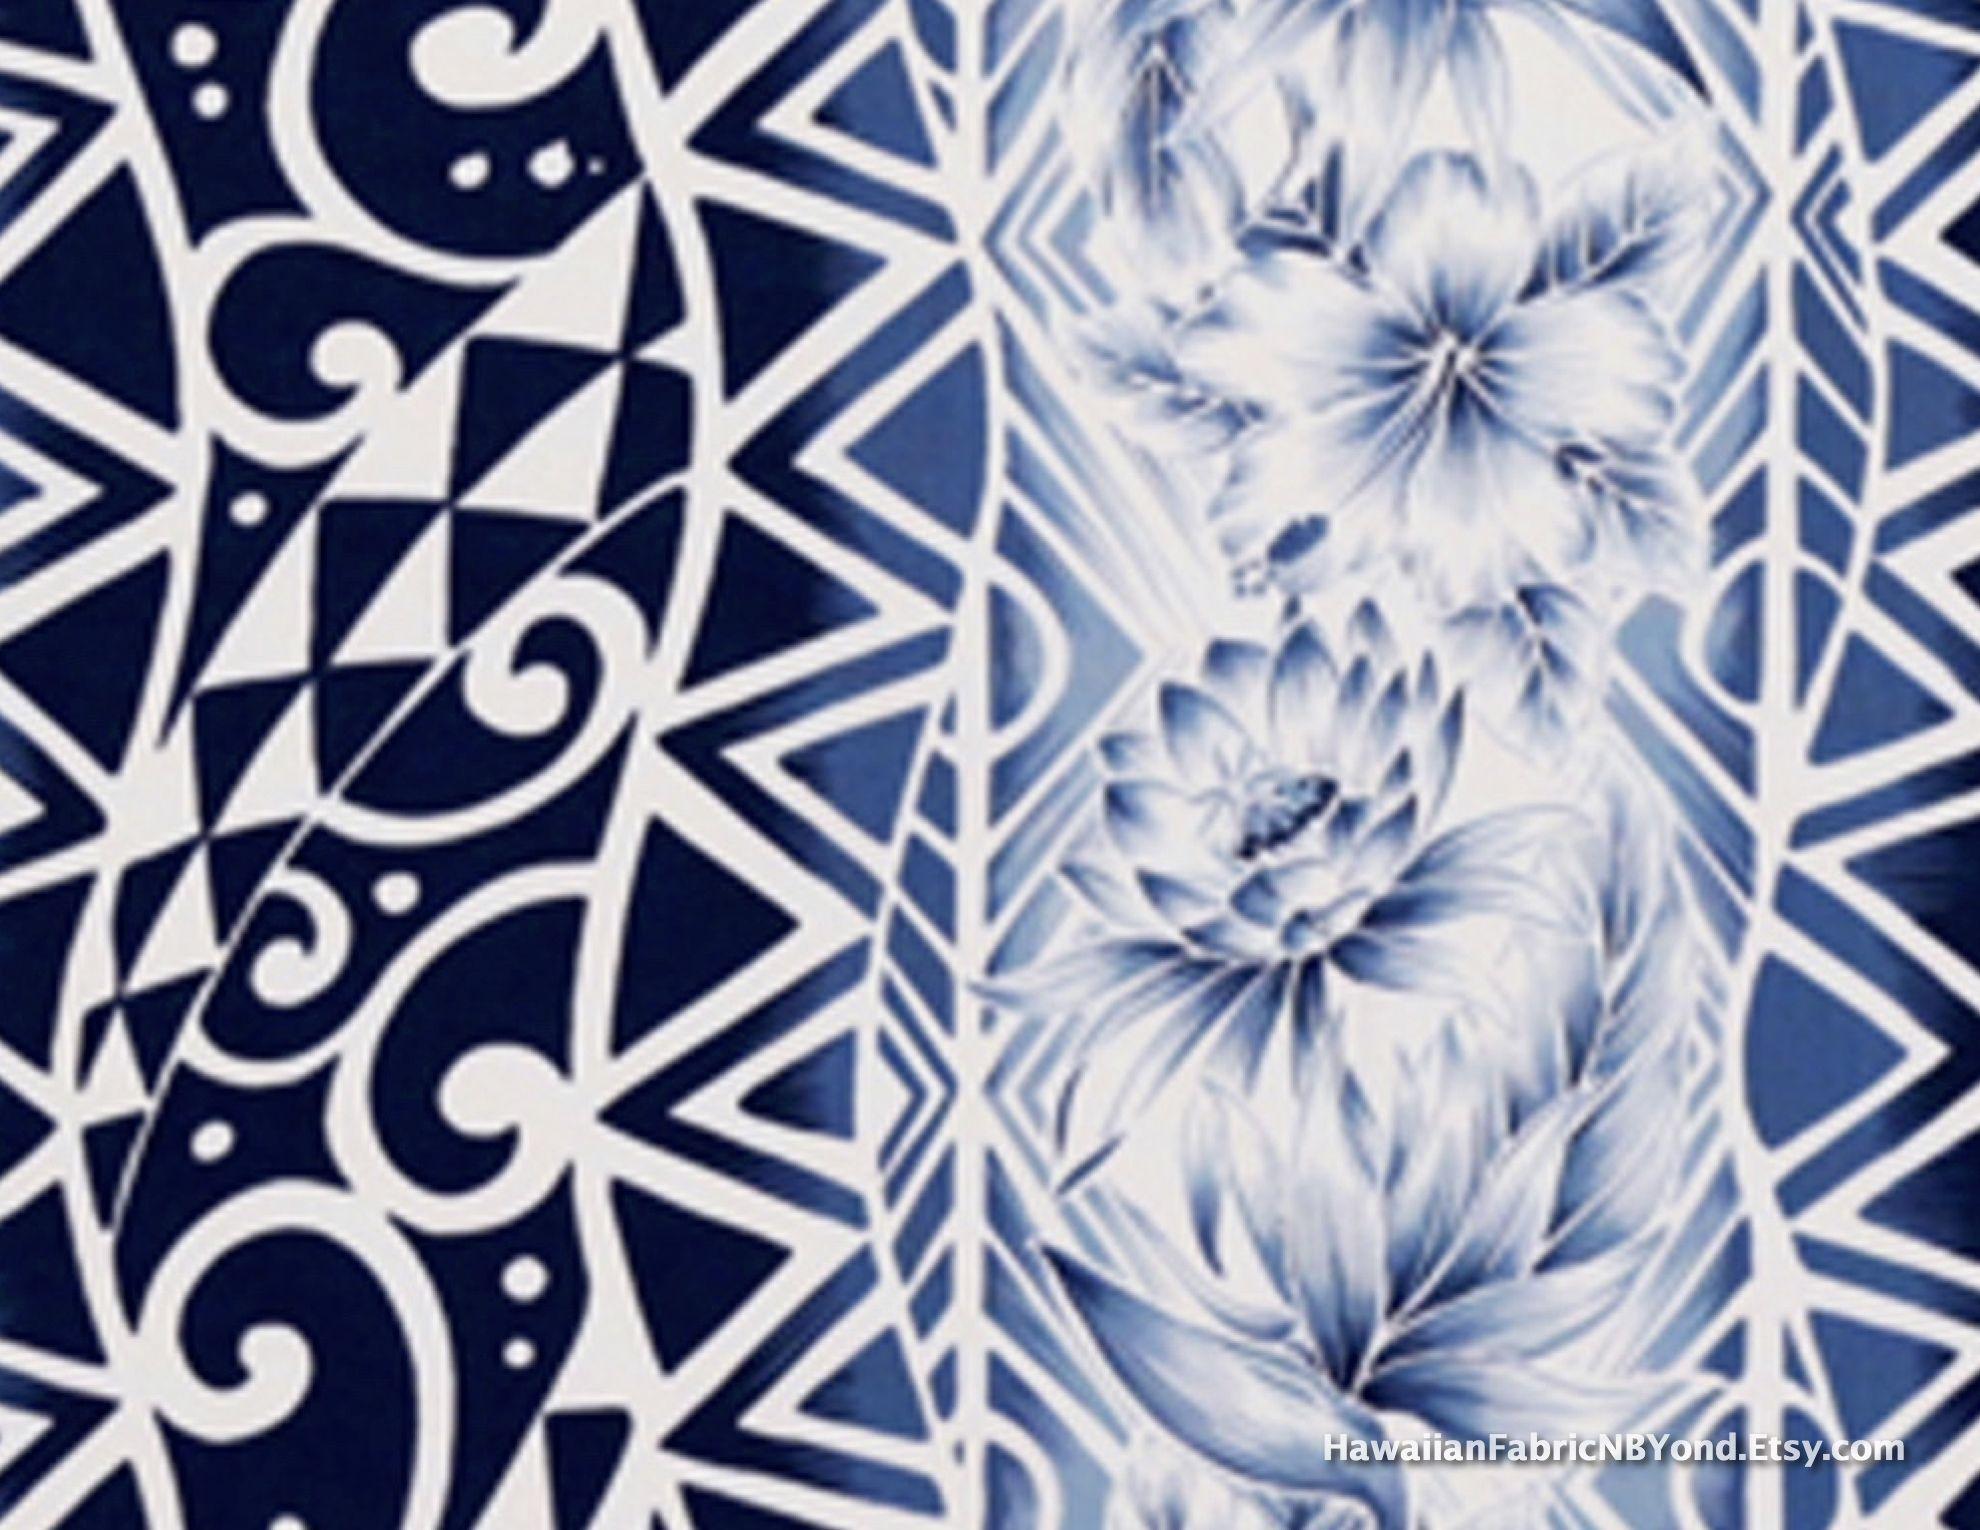 Hawaiian fabric: Tapa tattoo patterns and tropical flowers. Cotton ...